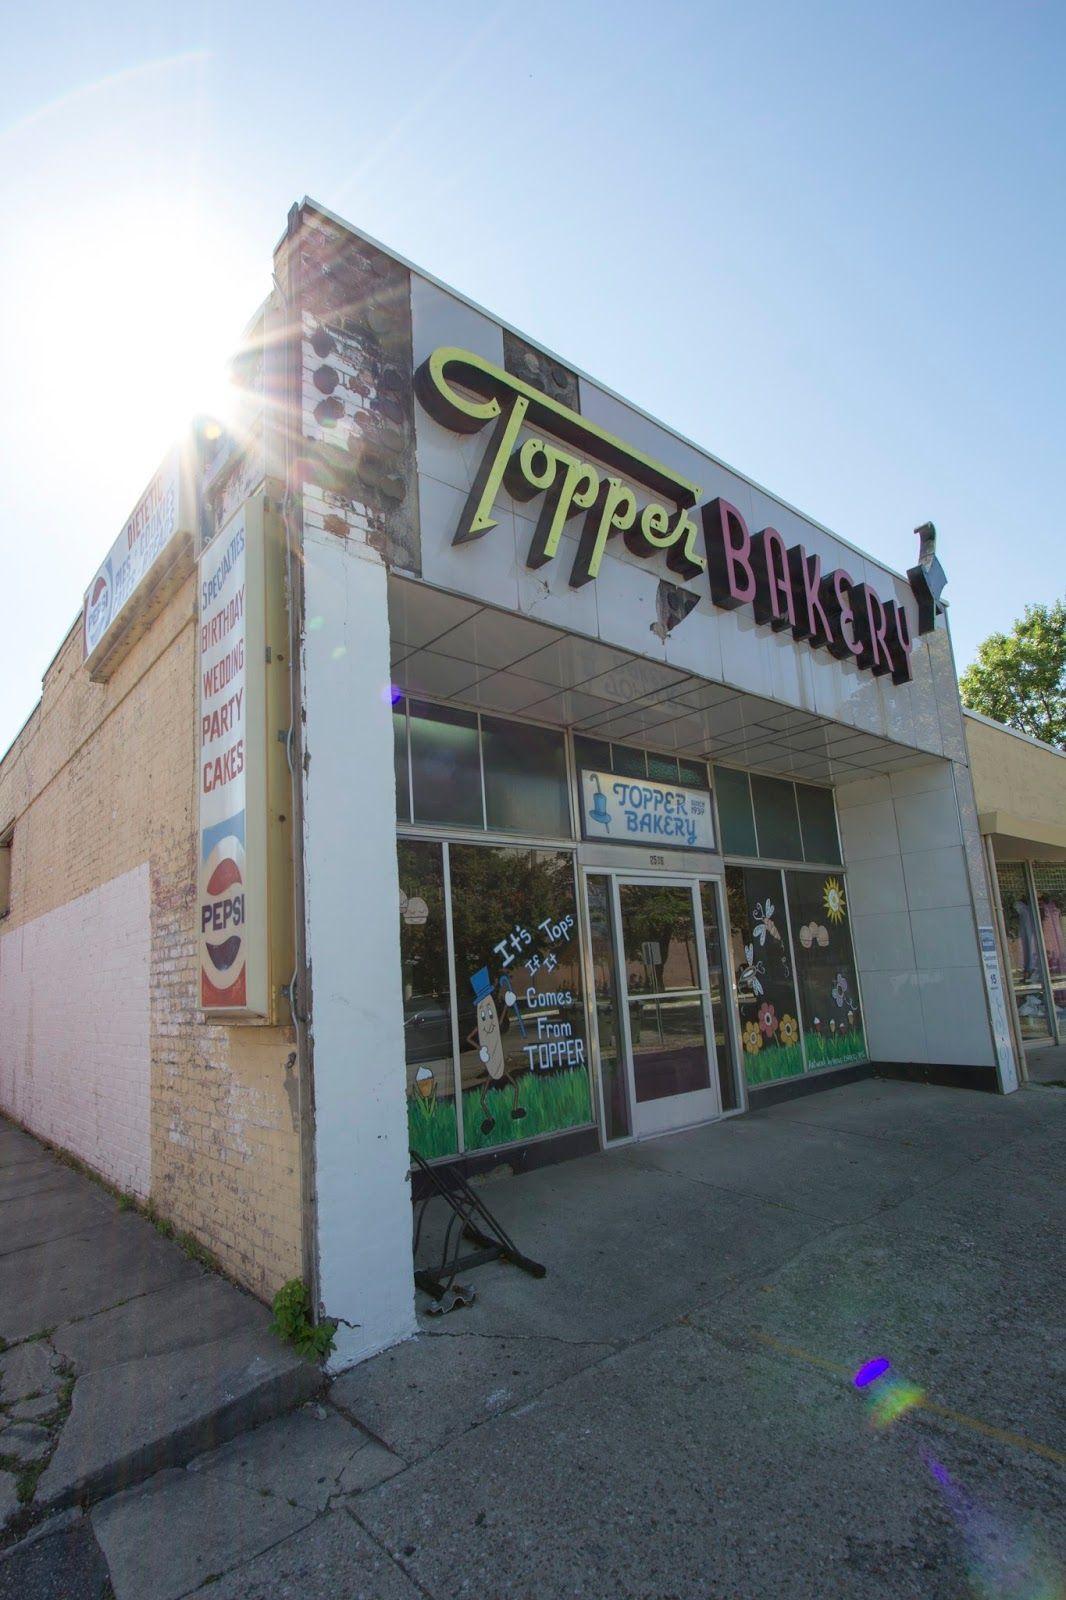 Topper Bakery Ogden, Utah Utah vacation, Ogden utah, Utah